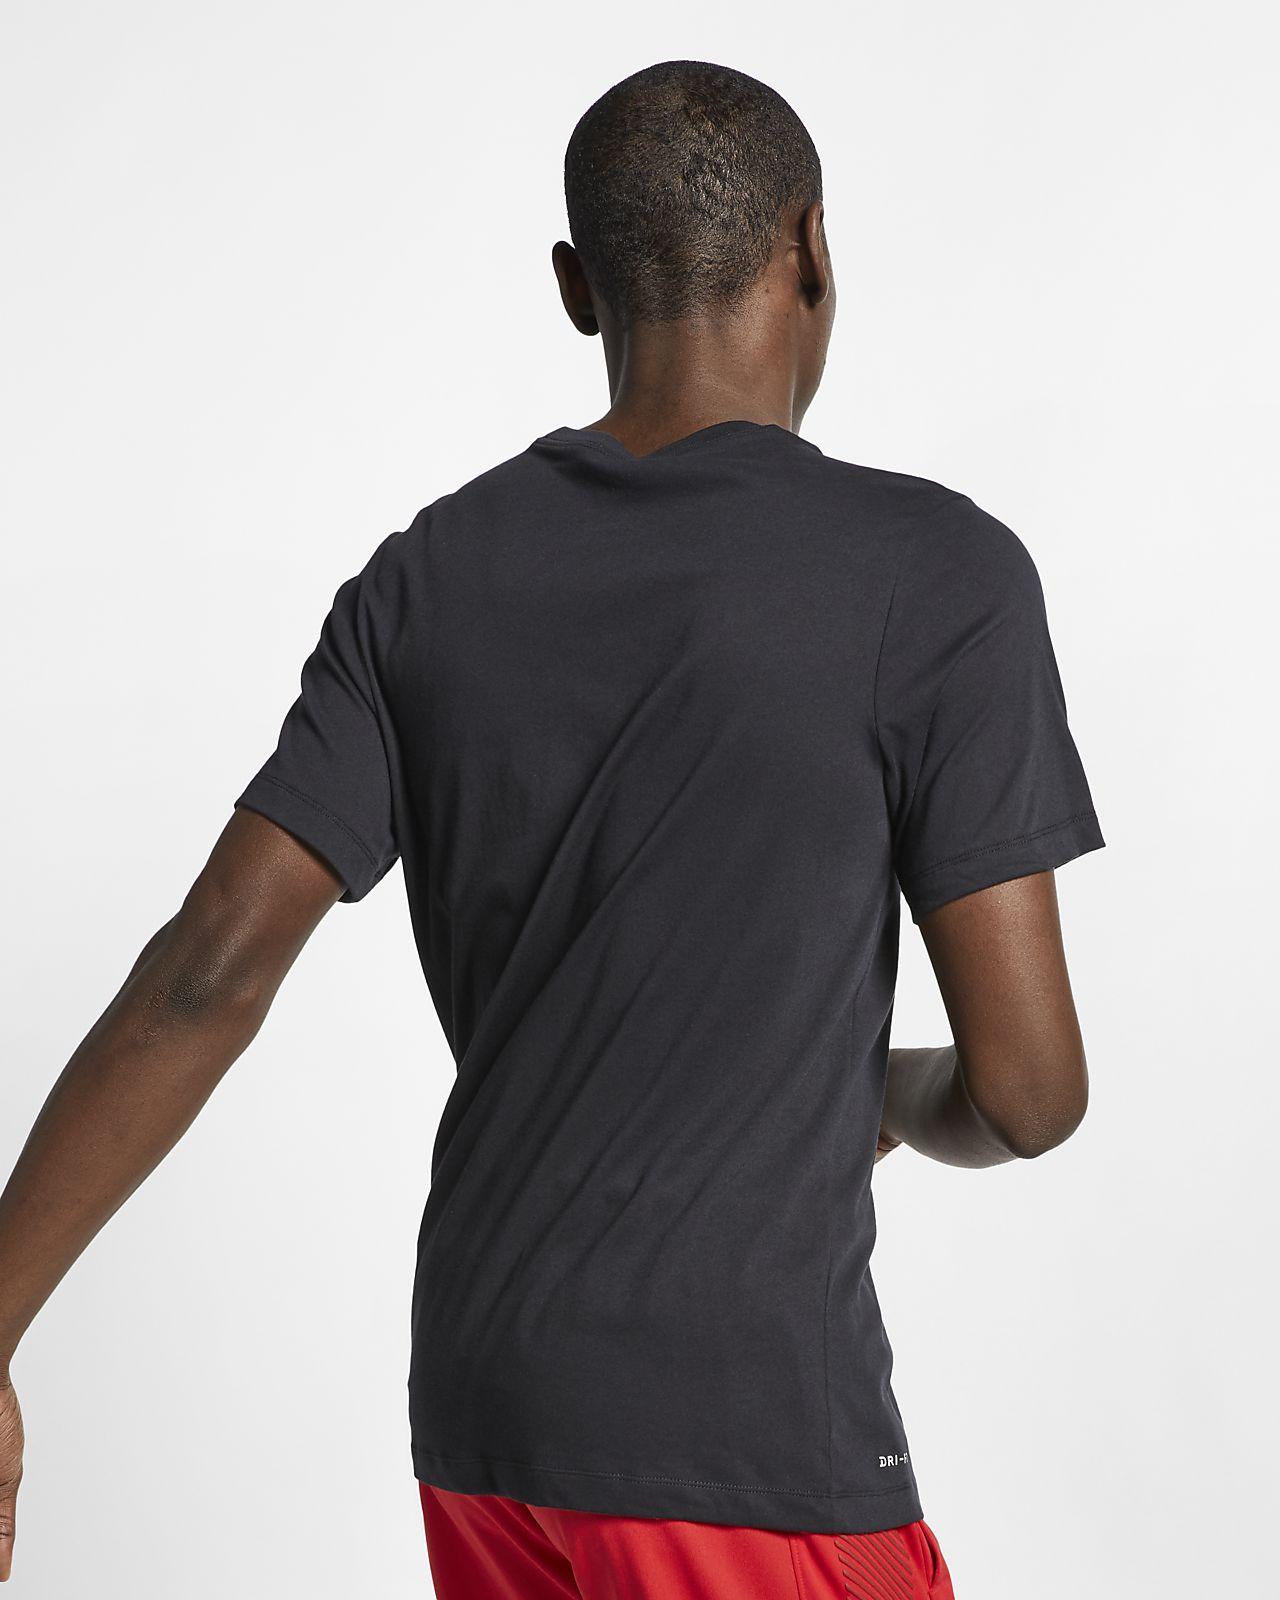 d63f8f097 Nike Dri-FIT Kyrie Men's Basketball T-Shirt. Nike.com